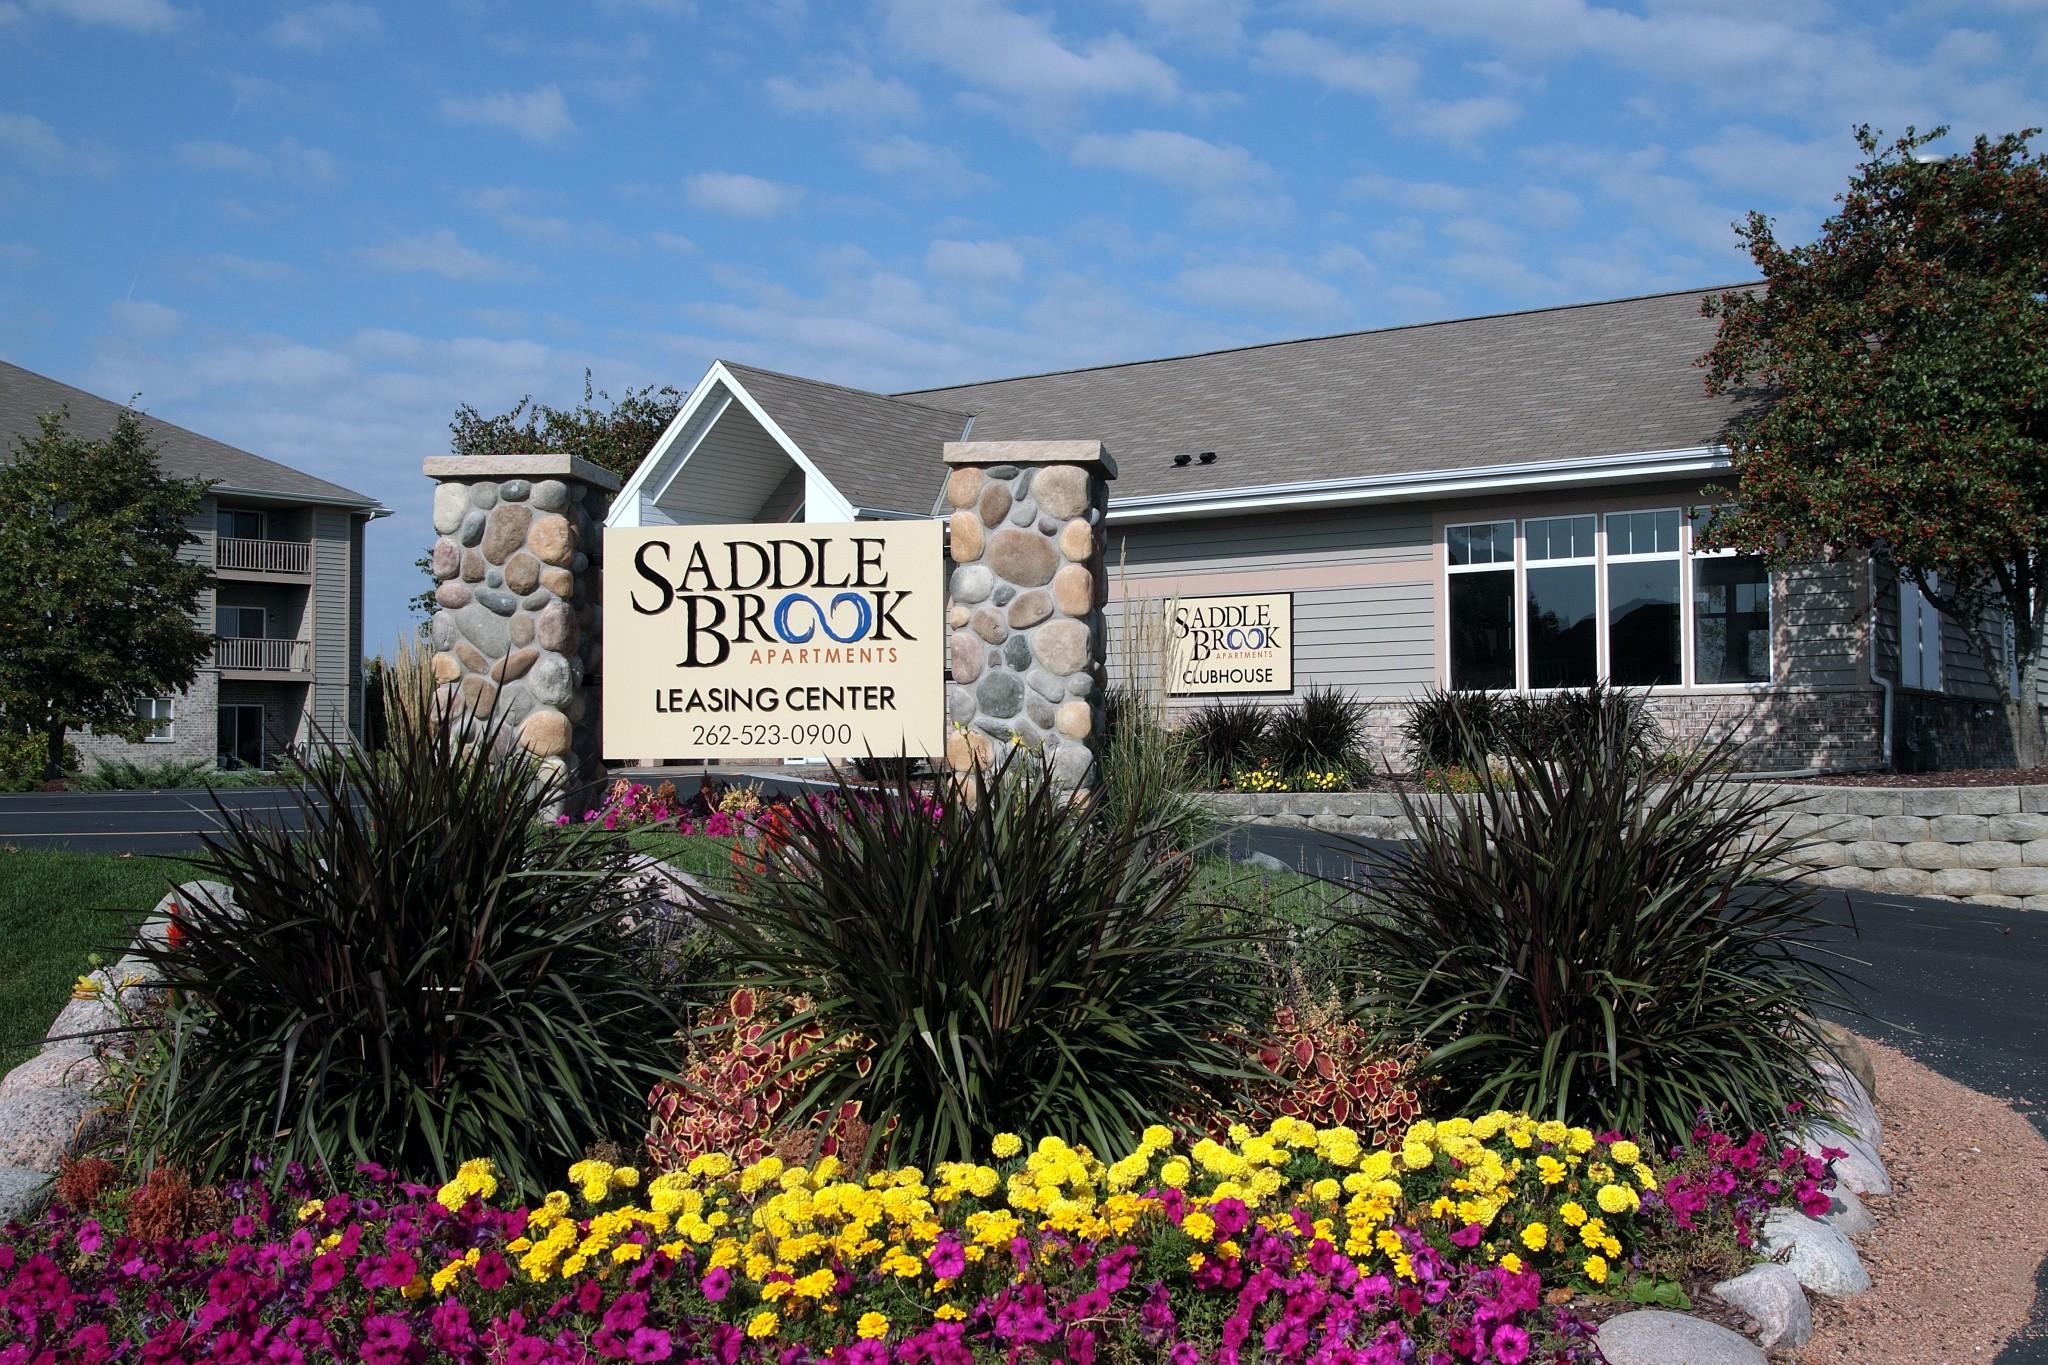 Saddle Brook